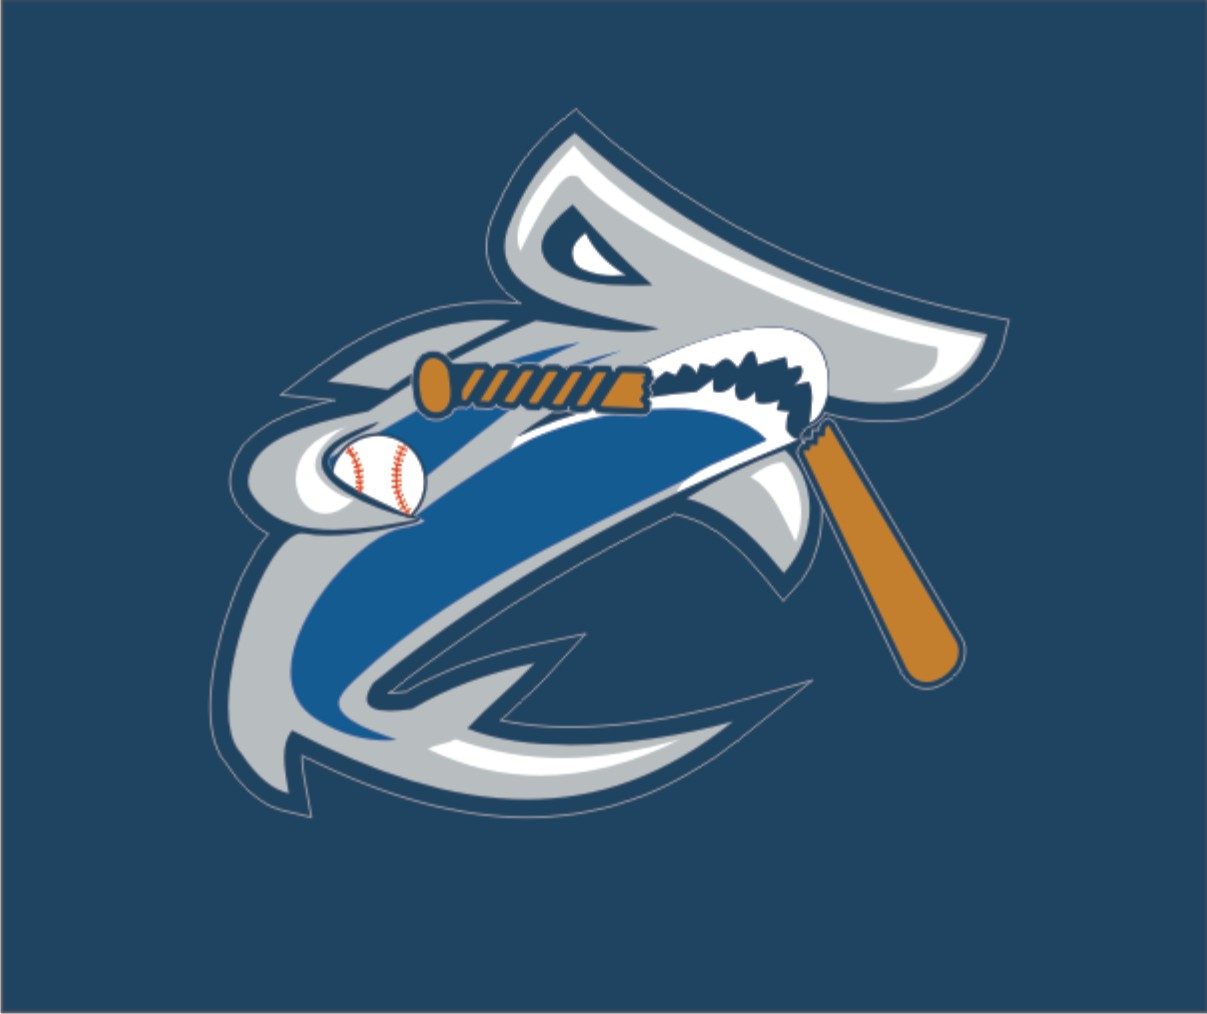 Hammerhead Logos